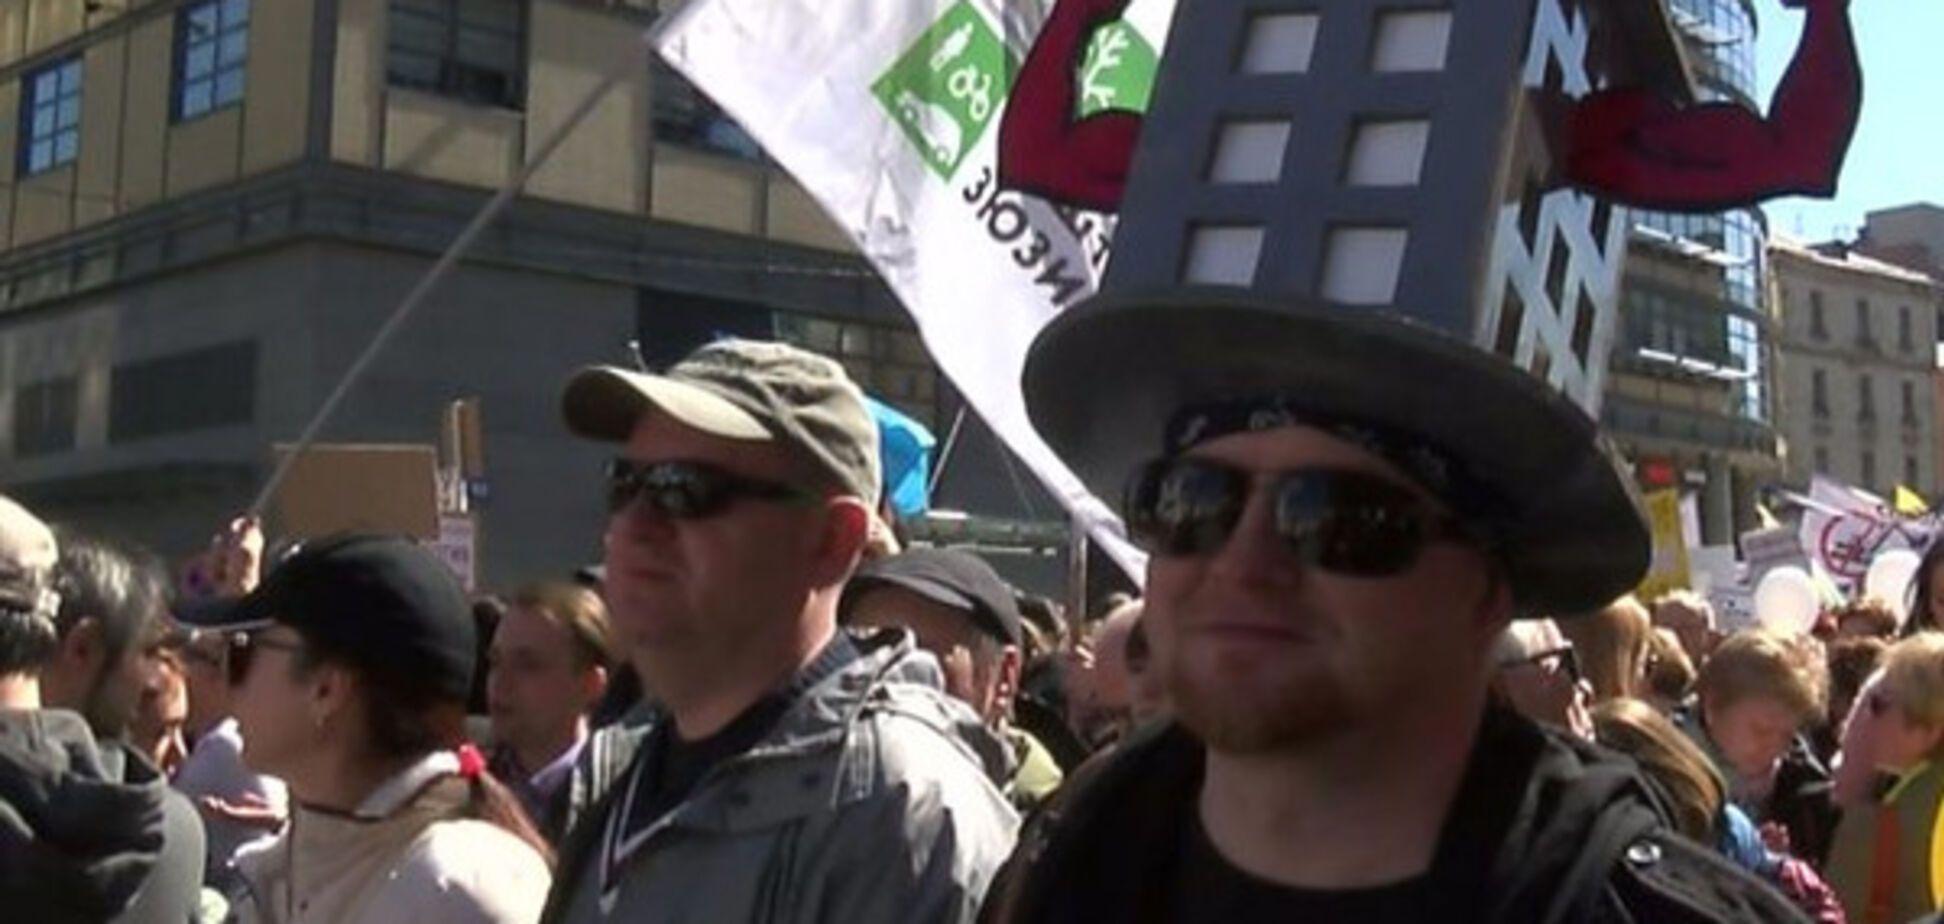 митинг, Москва, реновация